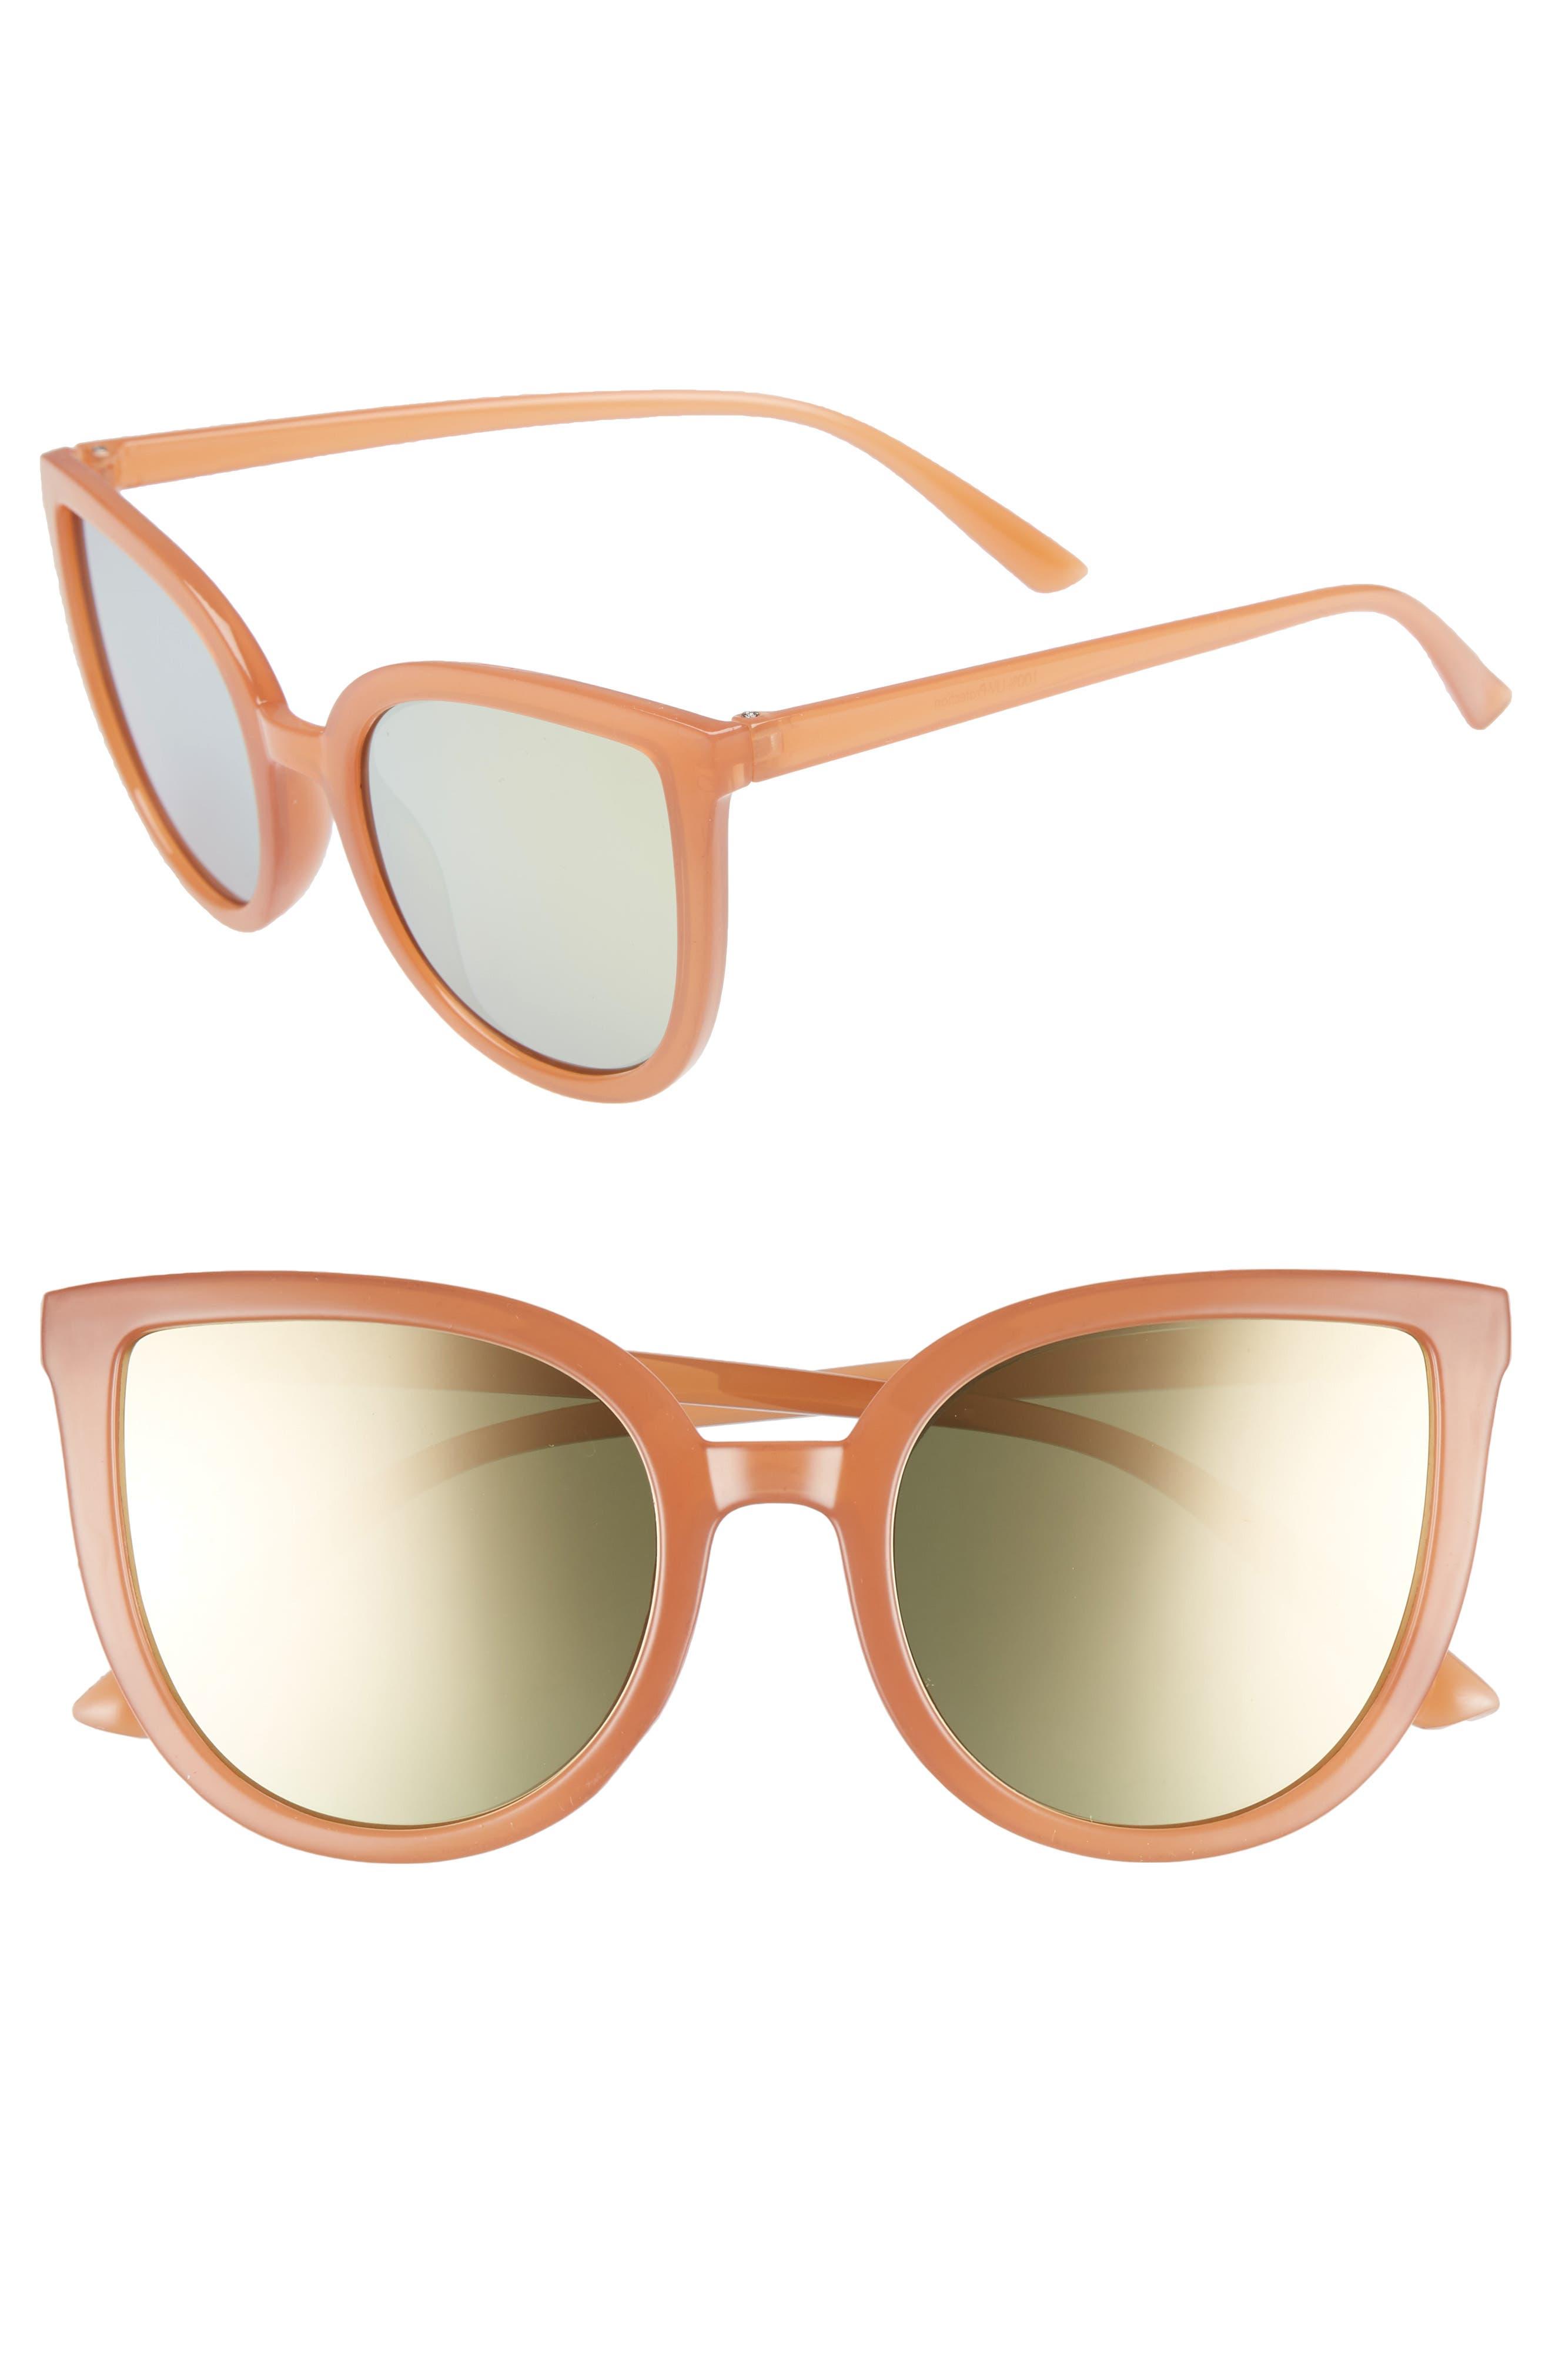 Thin Cat Eye Sunglasses,                         Main,                         color, Milky Peach/ Gold